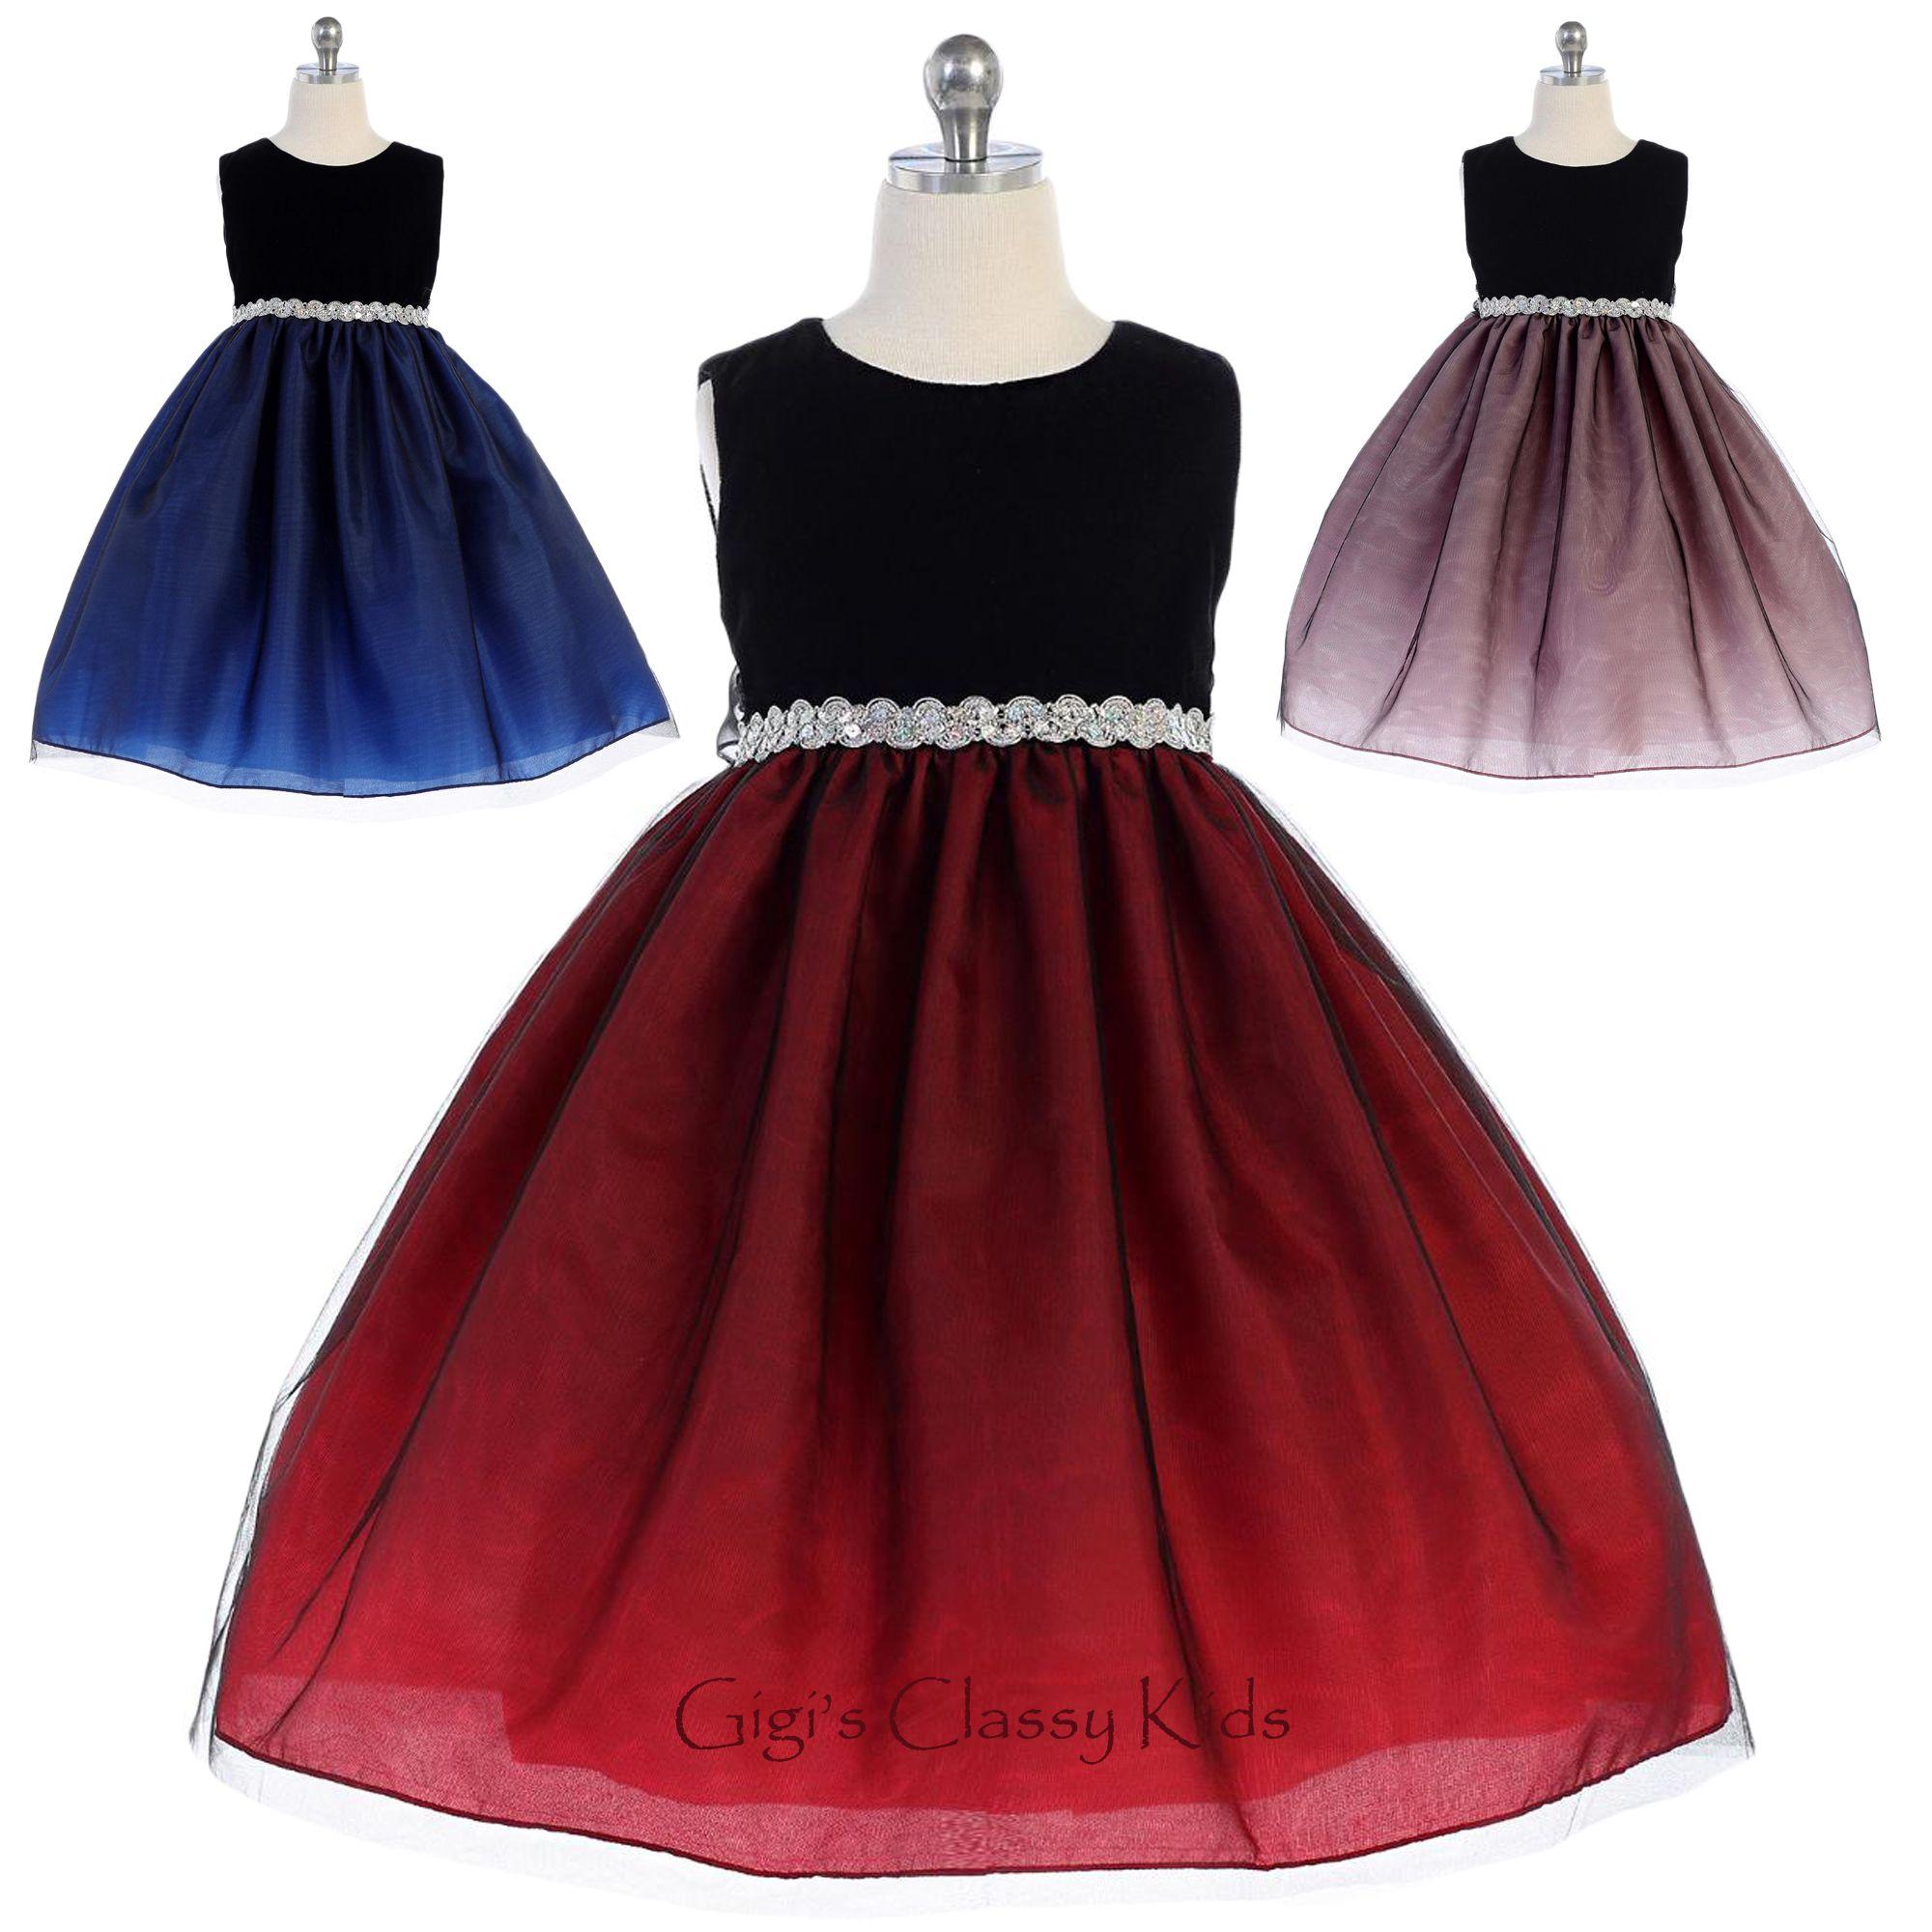 Flower Girls Black Velvet Organza Dress Christmas Holidays Party Wedding New 385